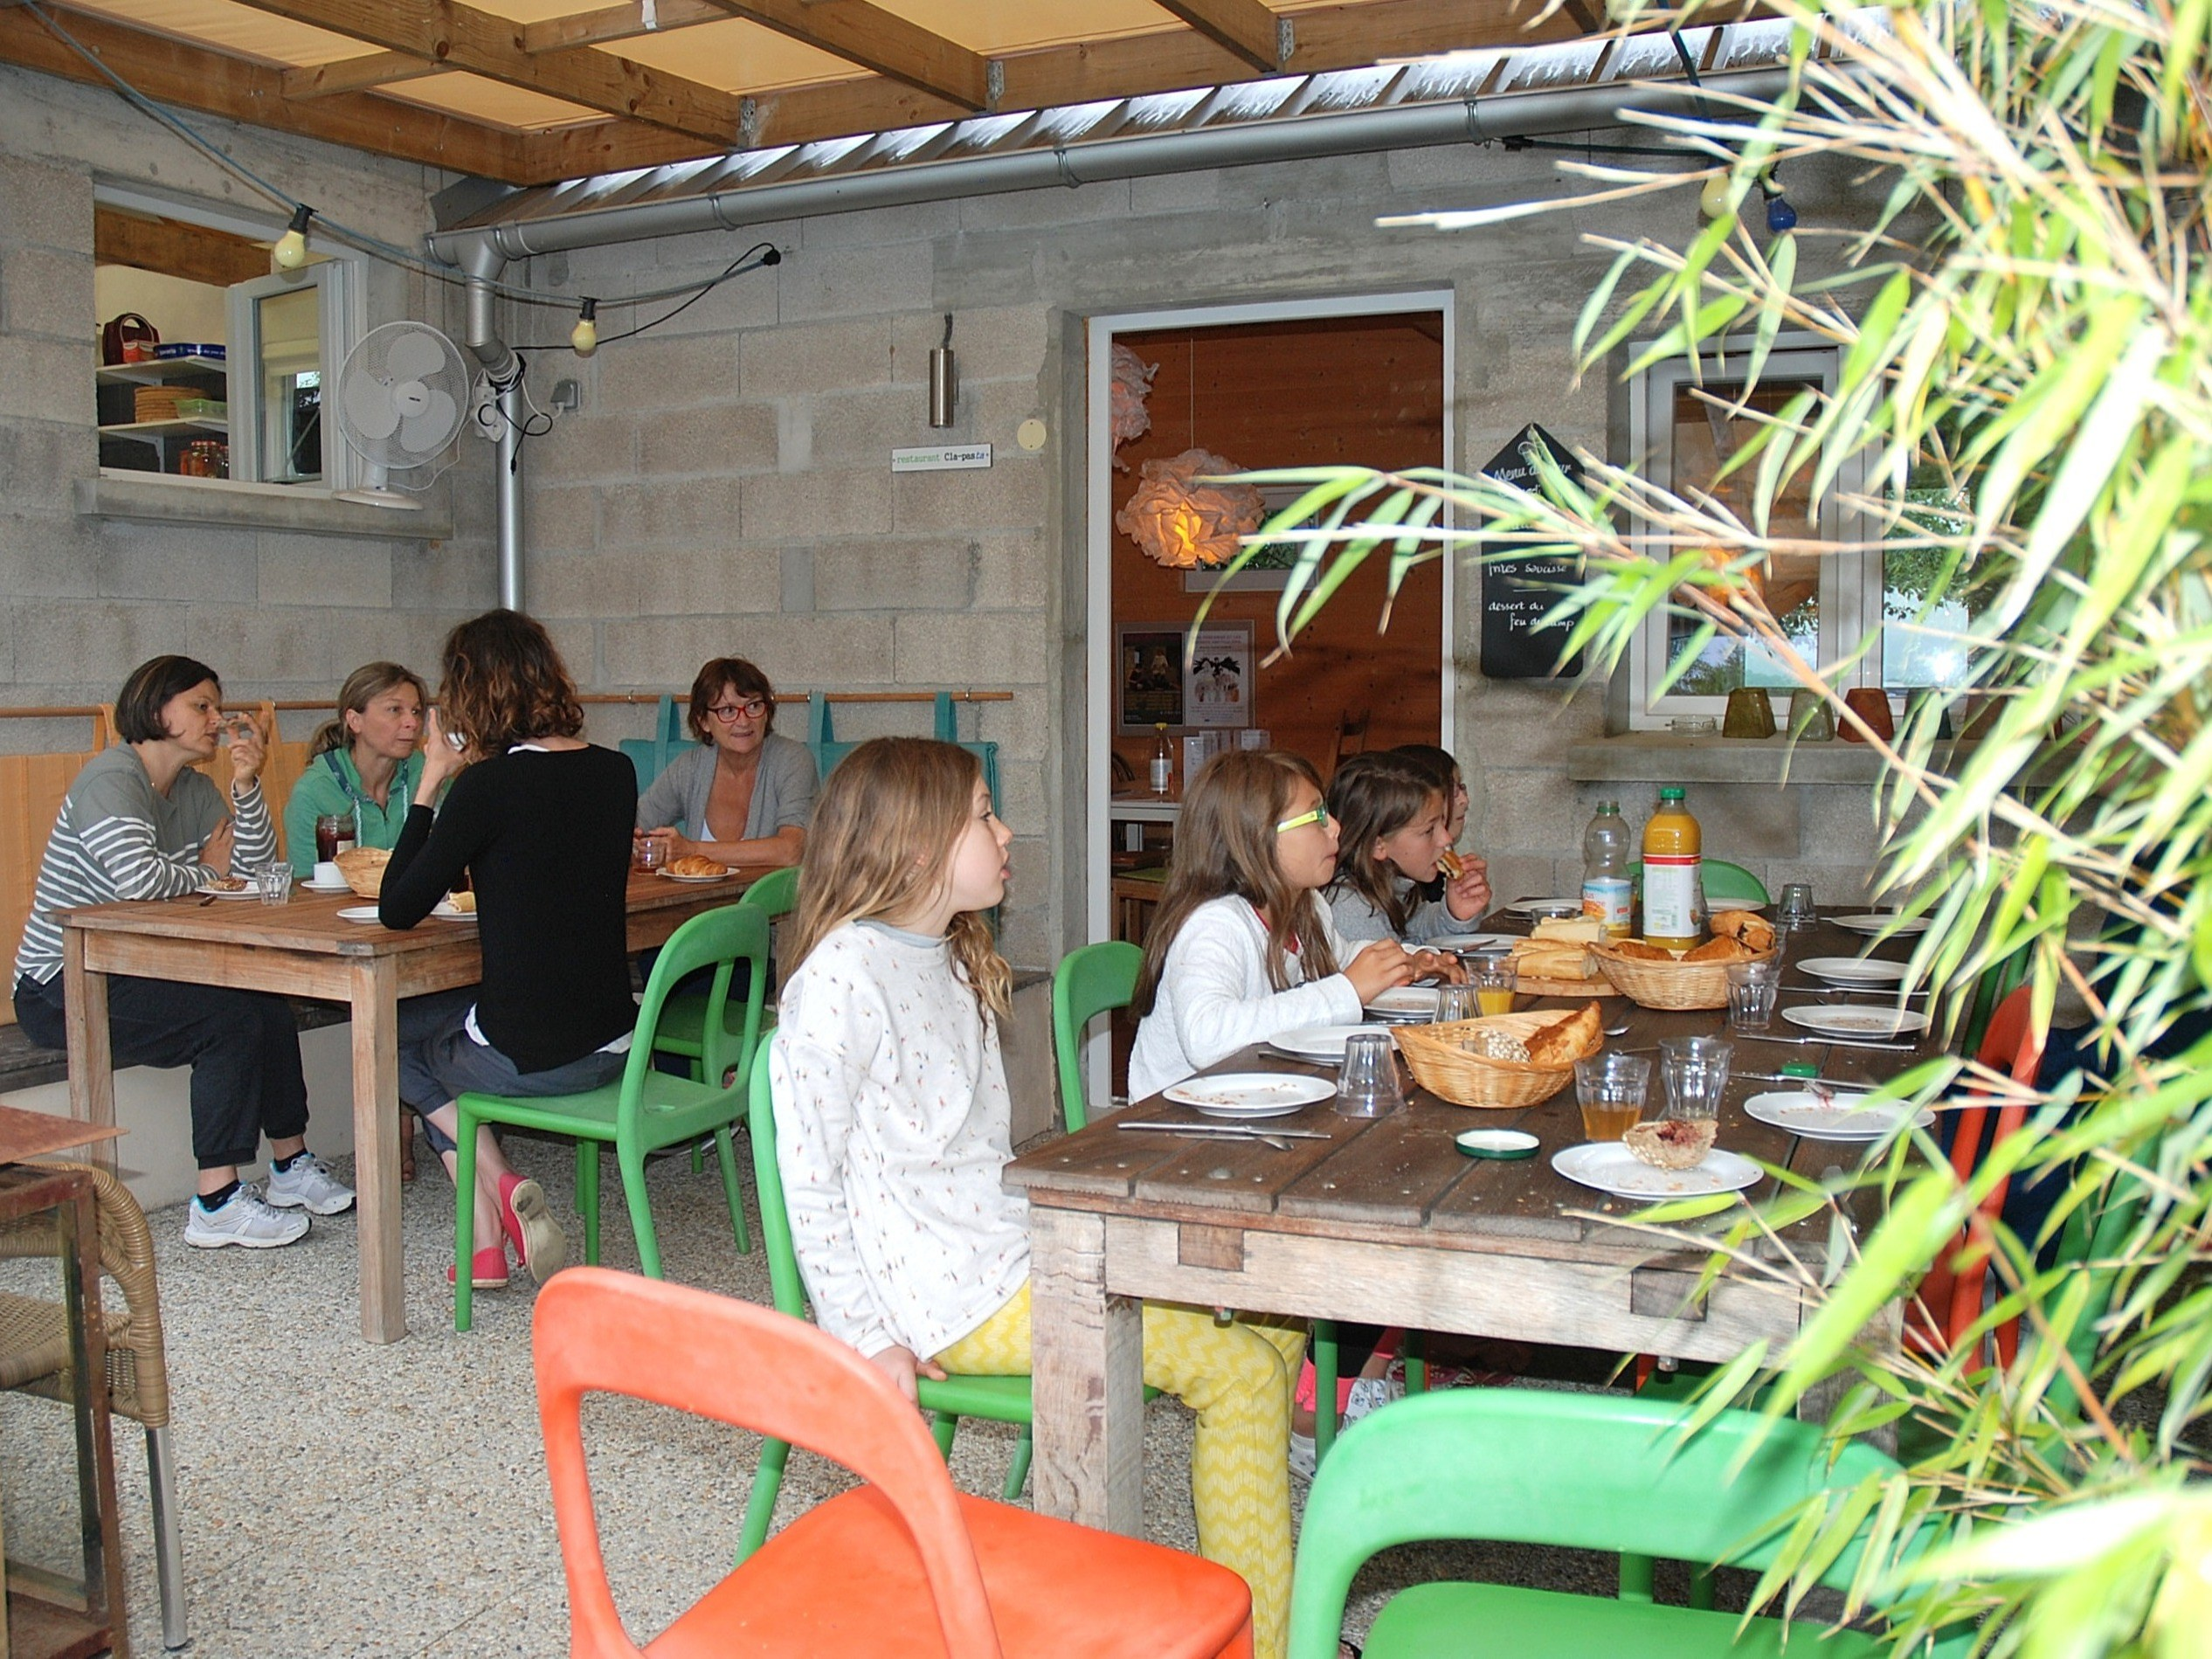 Bar restaurant Cla-pasta